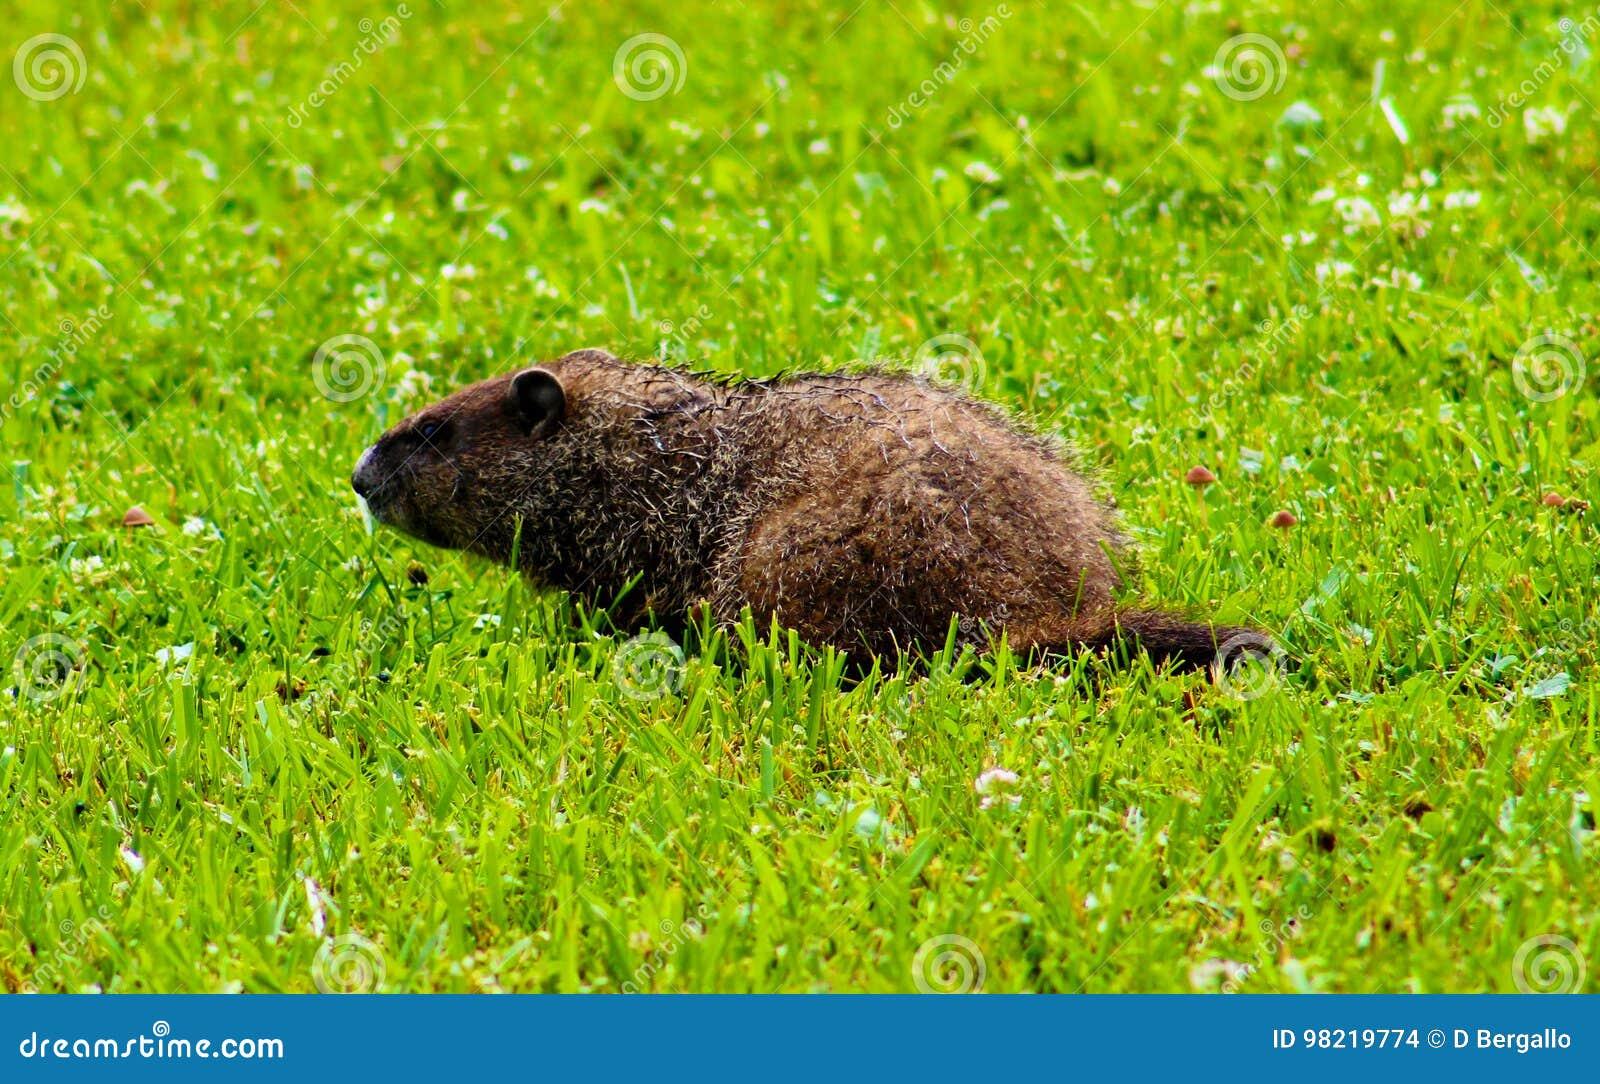 Cute Groundhog In My Backyard Stock Photo - Image of ...